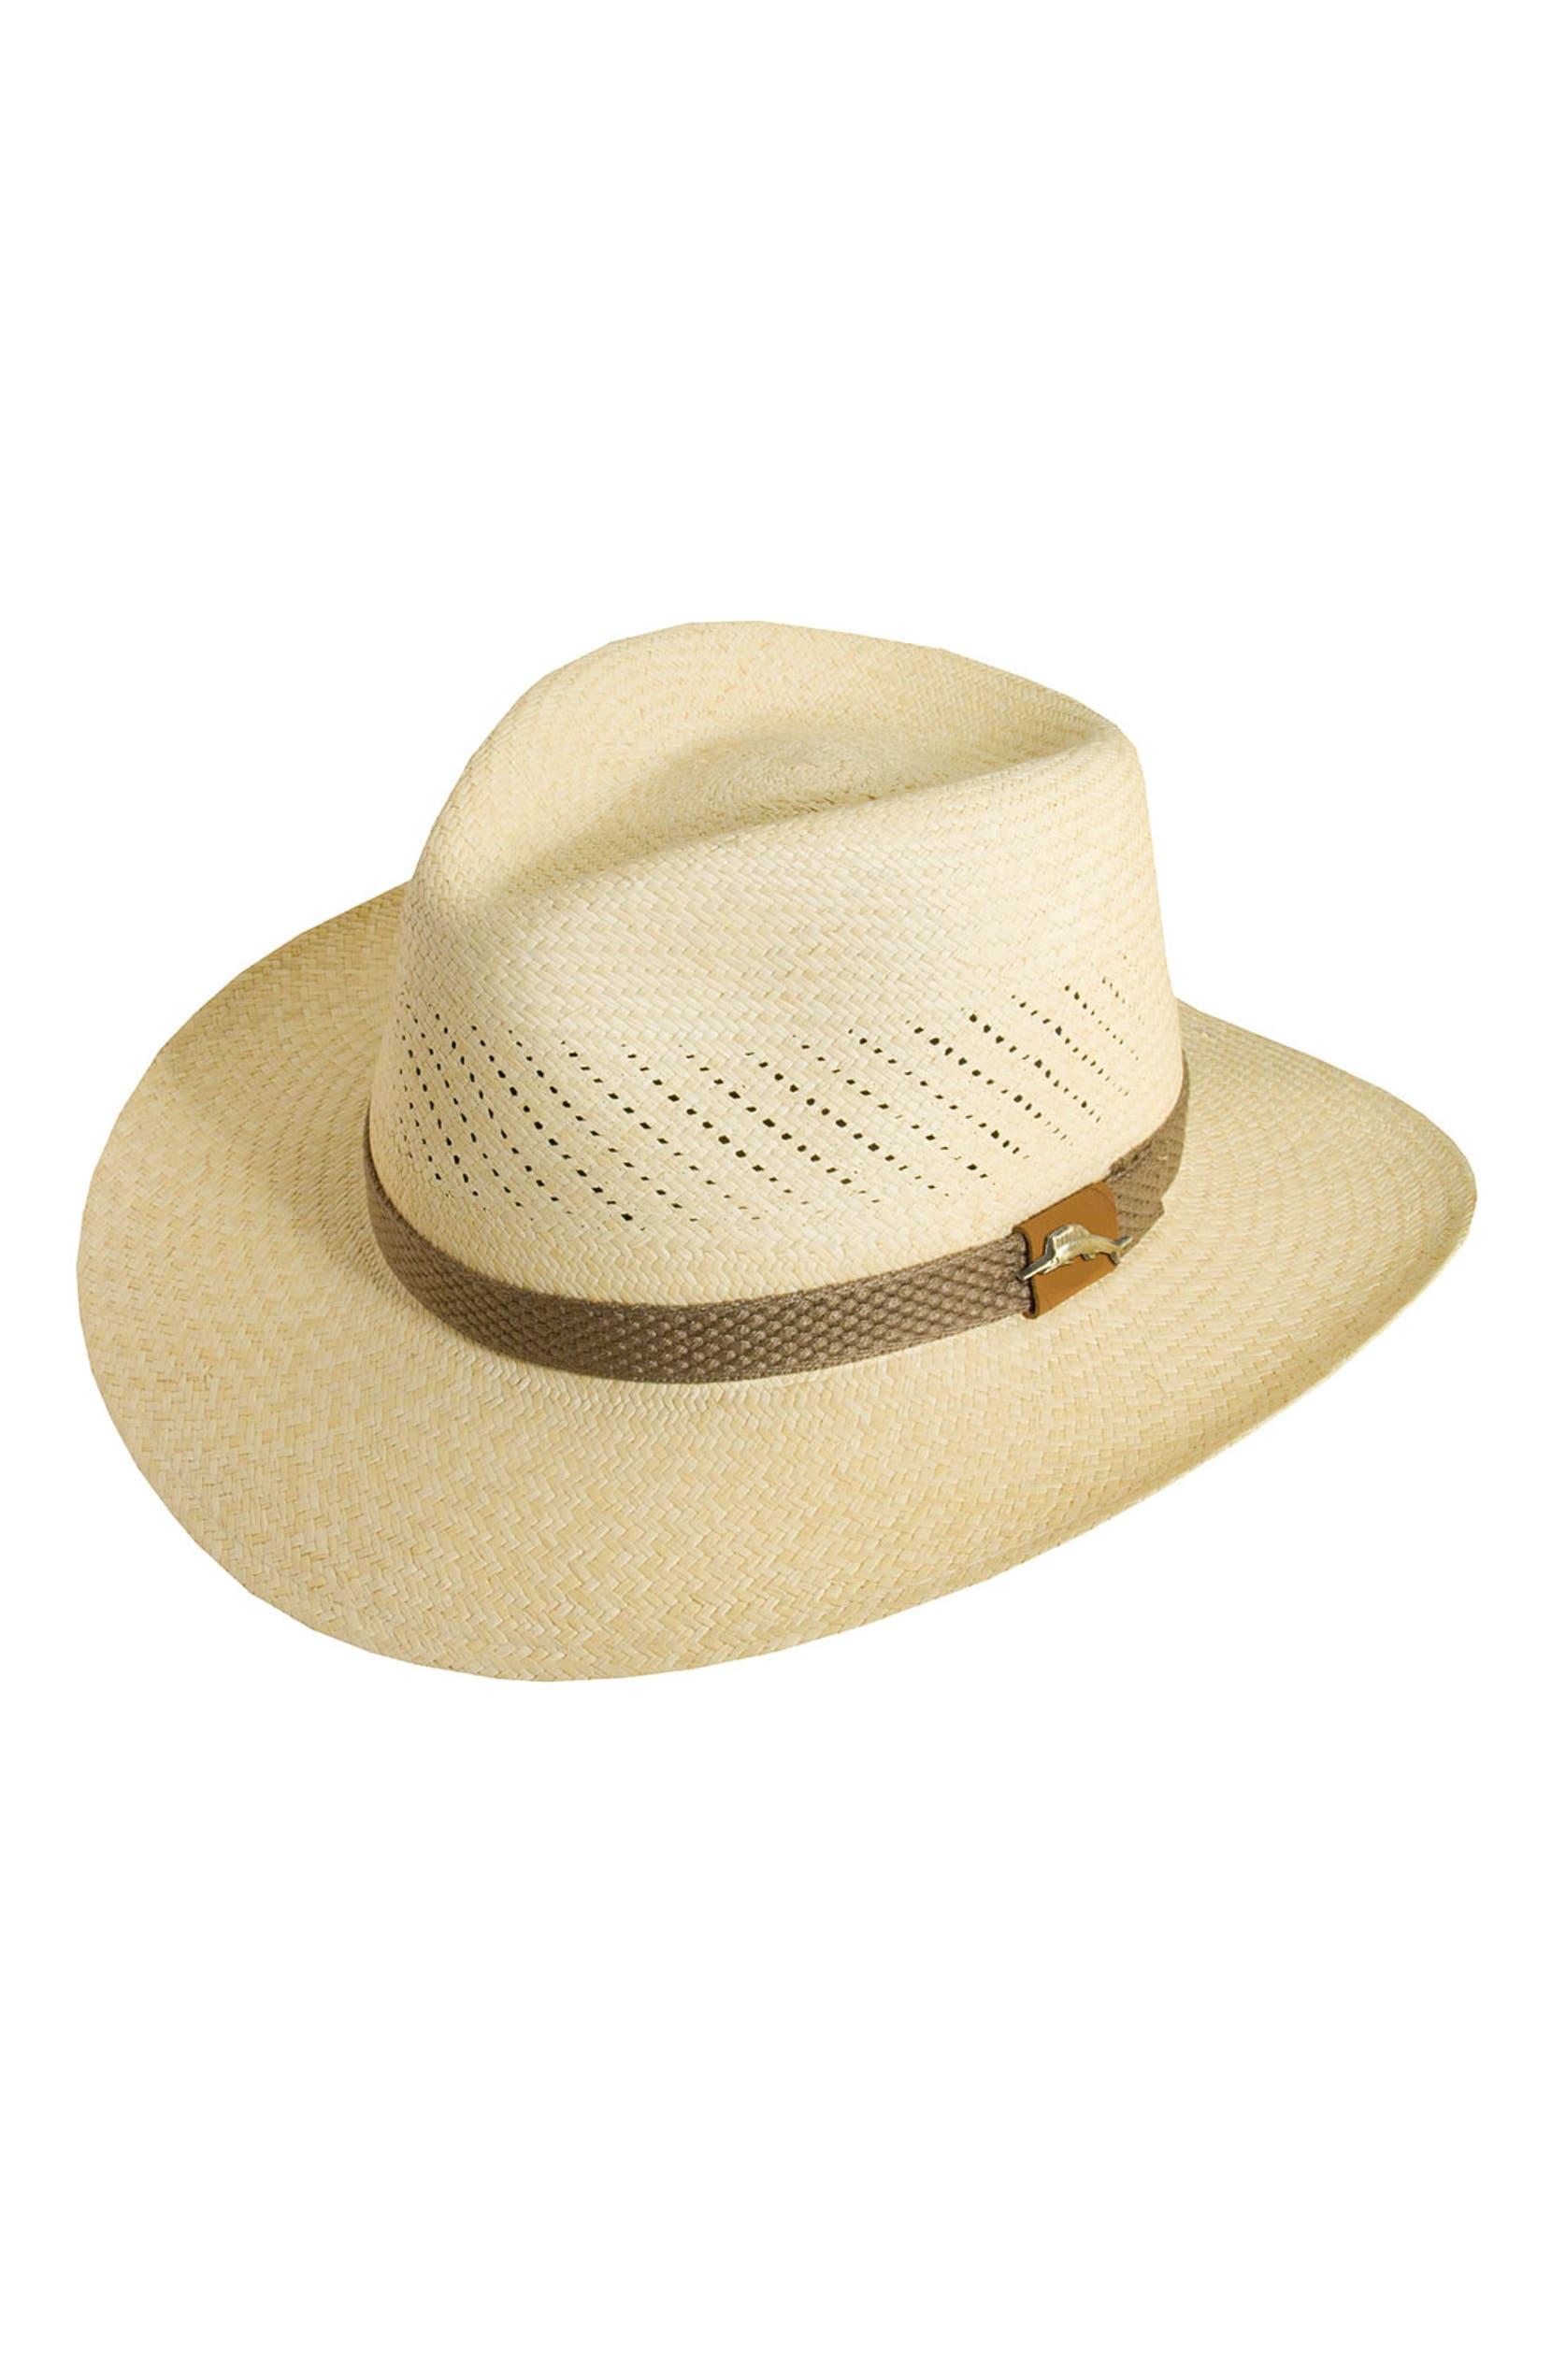 Tommy Bahama Safari Panama Straw Fedora  3e2ccb58f5c